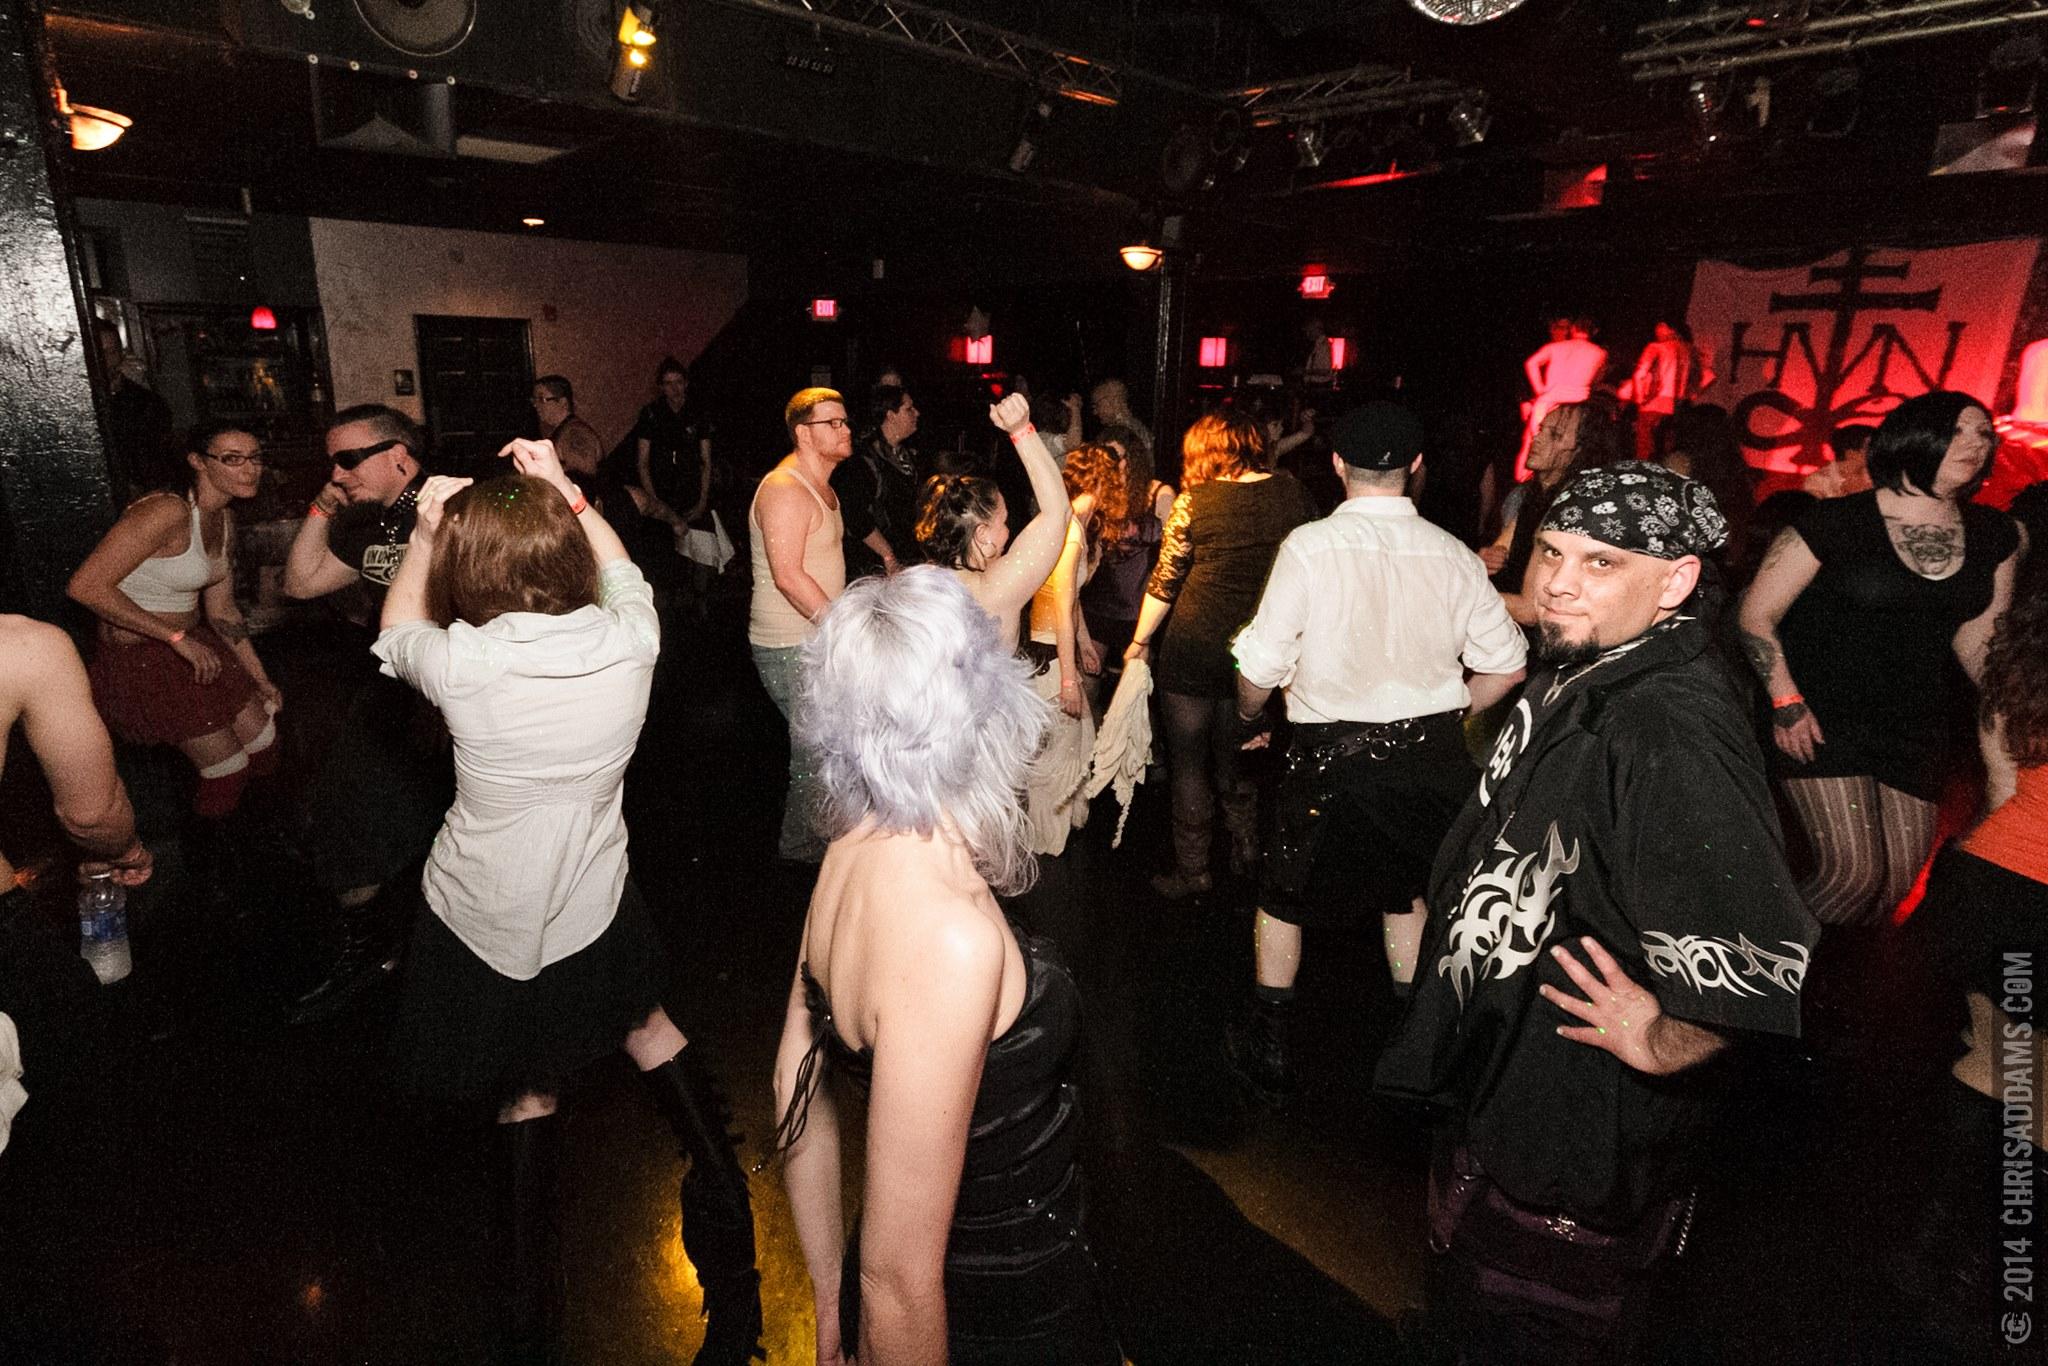 TheHavenClub-Goth-Industrial-Dance-Alternative-Northampton-MA (127).jpg